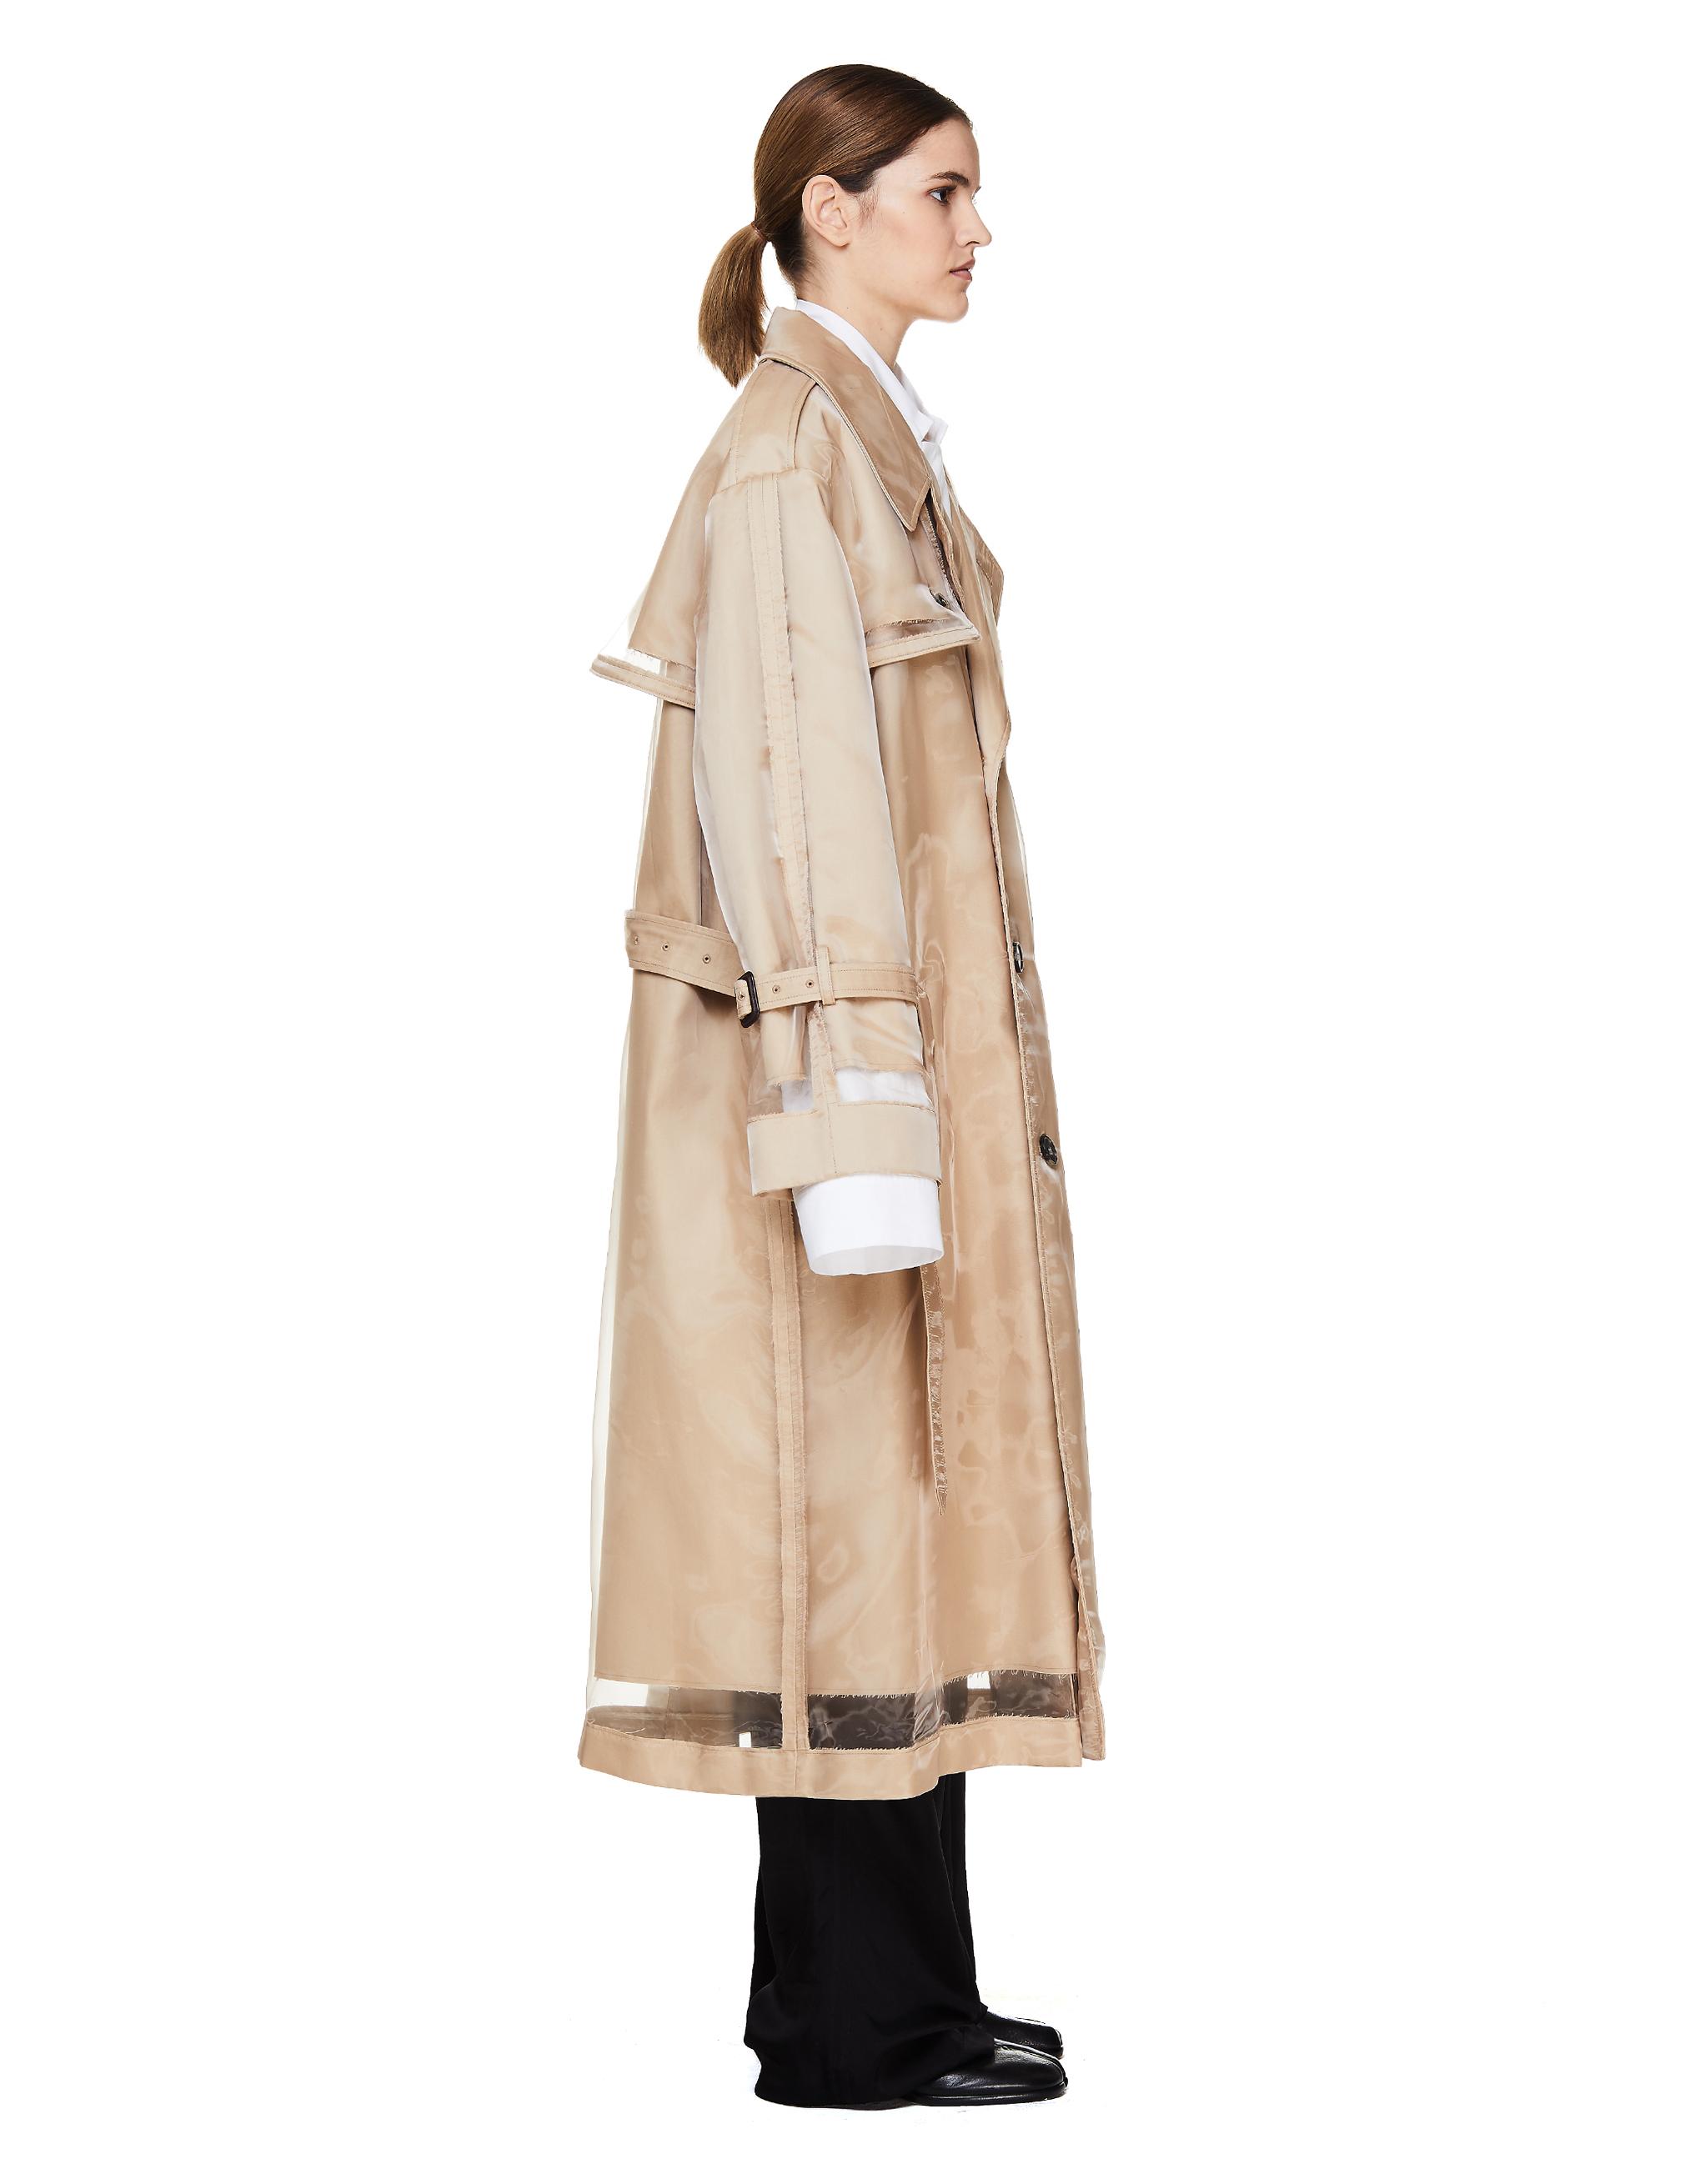 Maison Margiela Transparent Beige Trench Coat